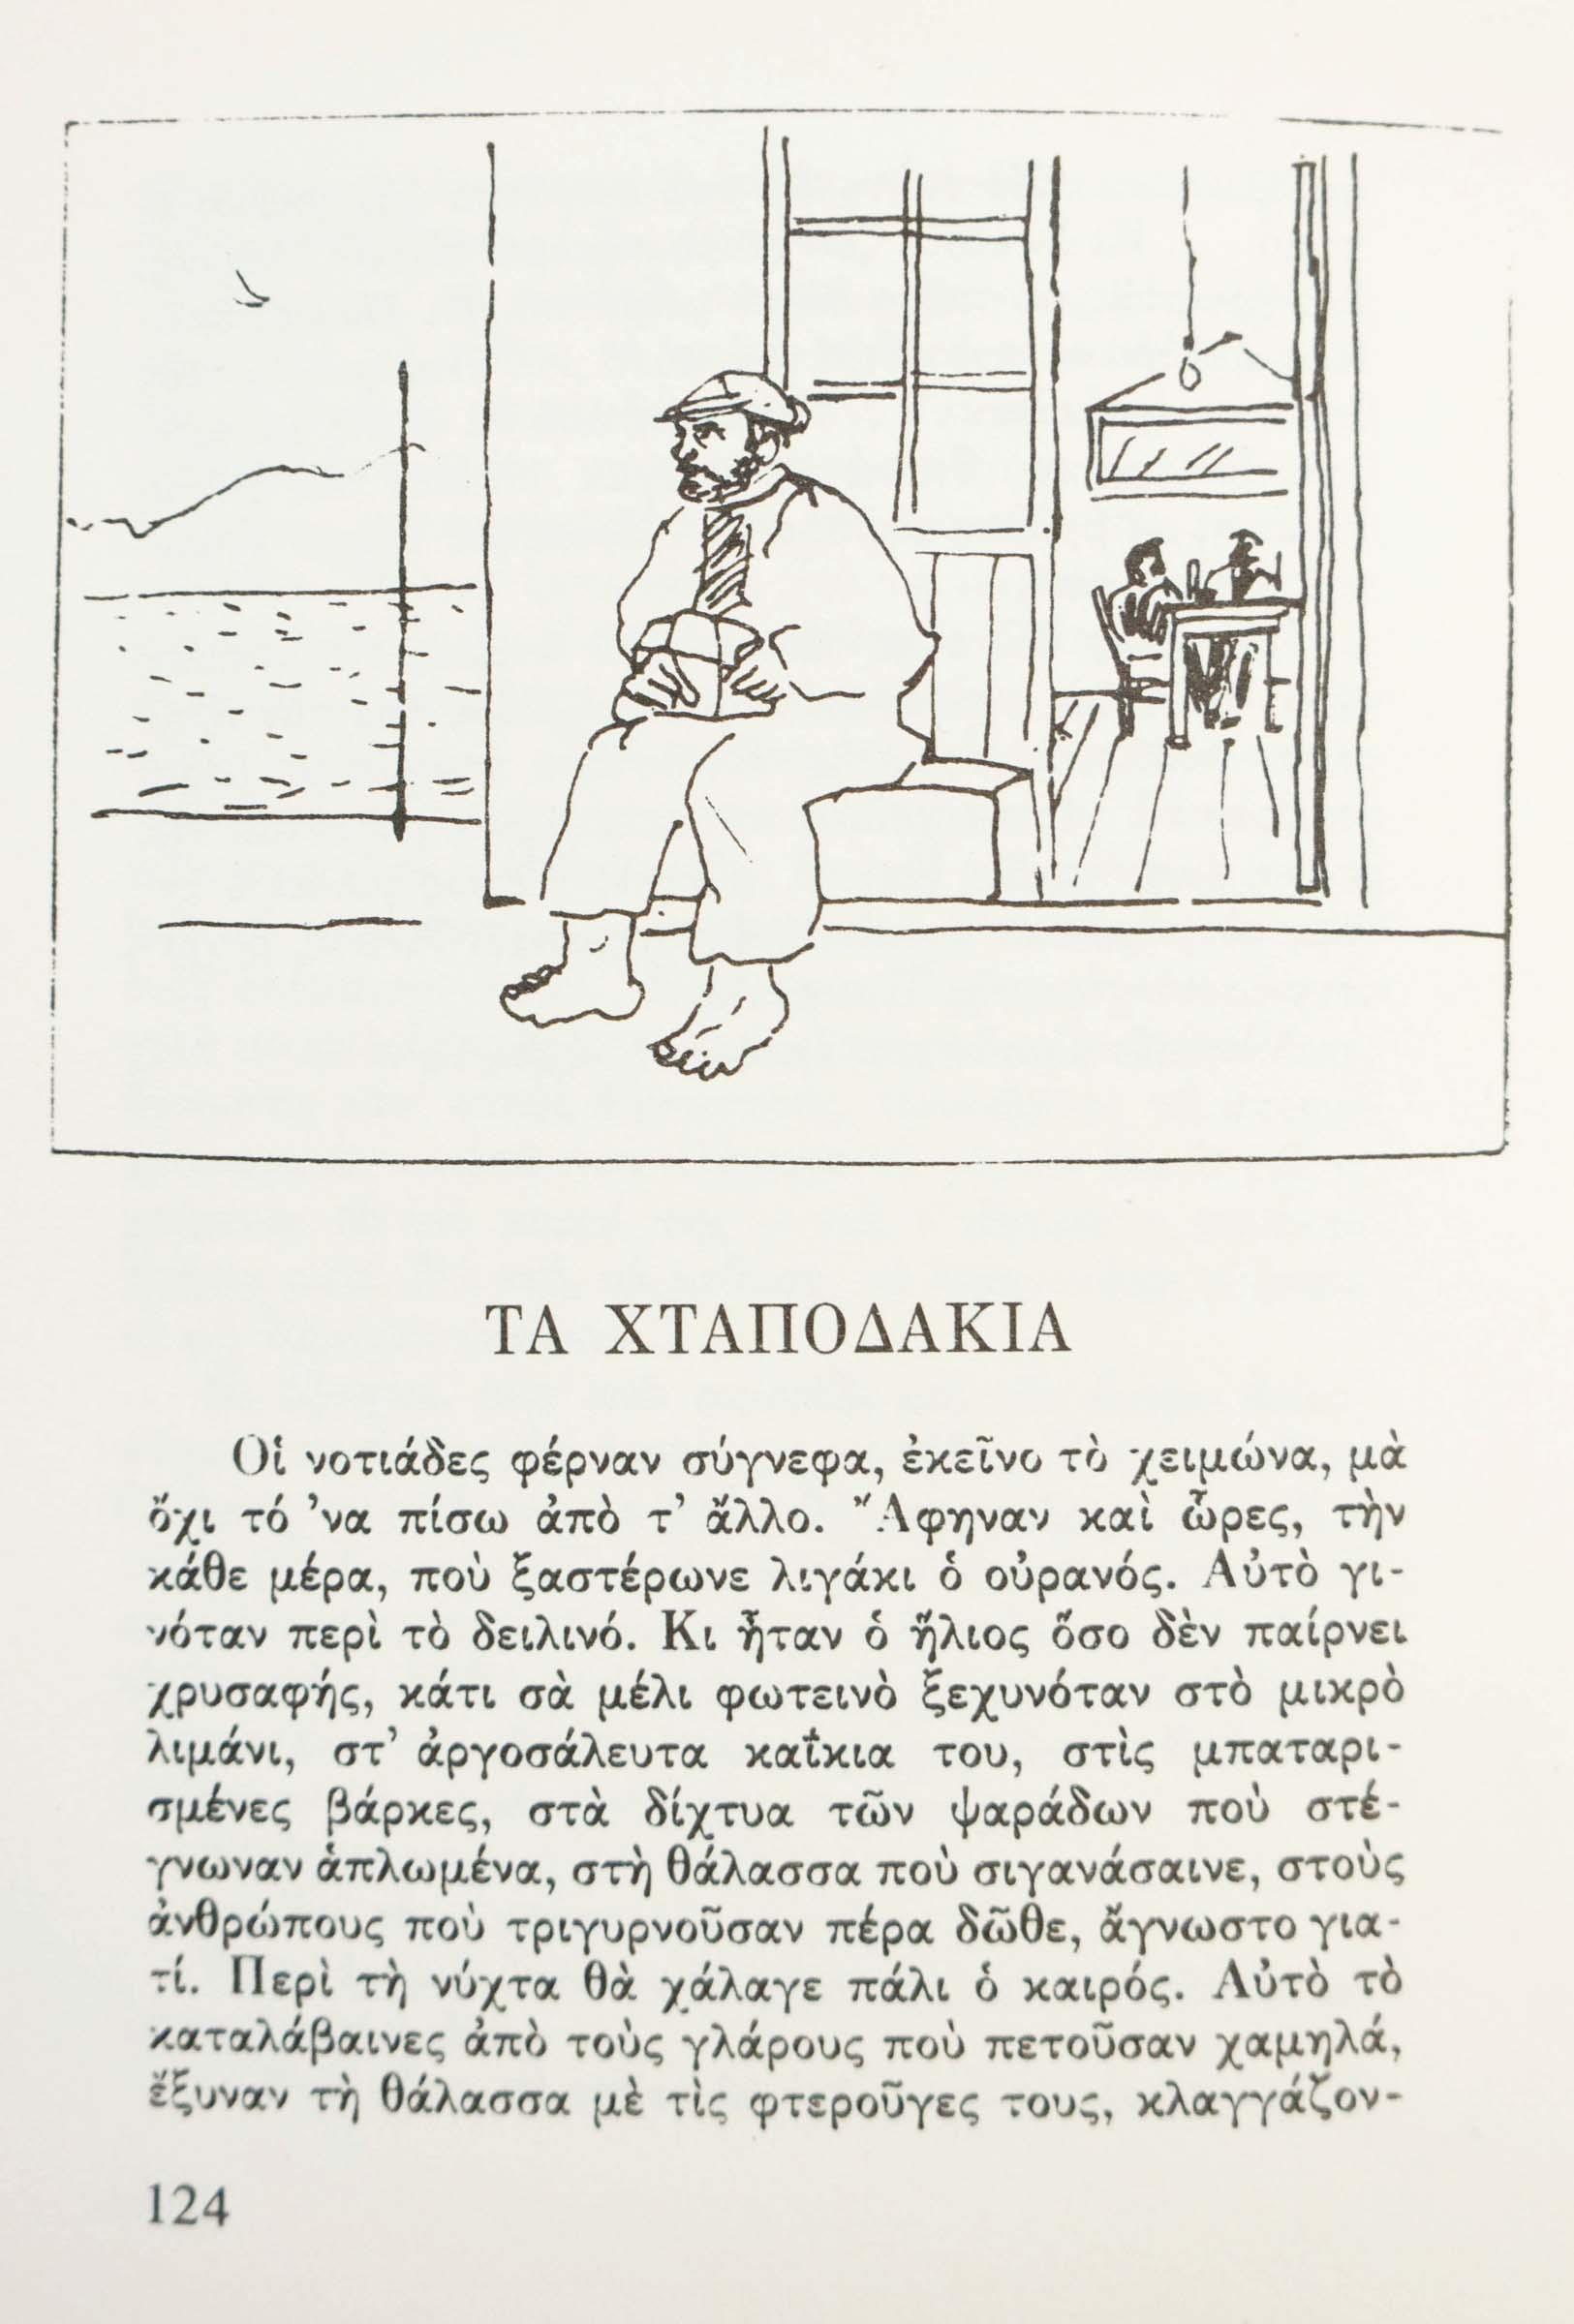 site-7-24-14 to nero tis vrochis illustrations-5.jpg